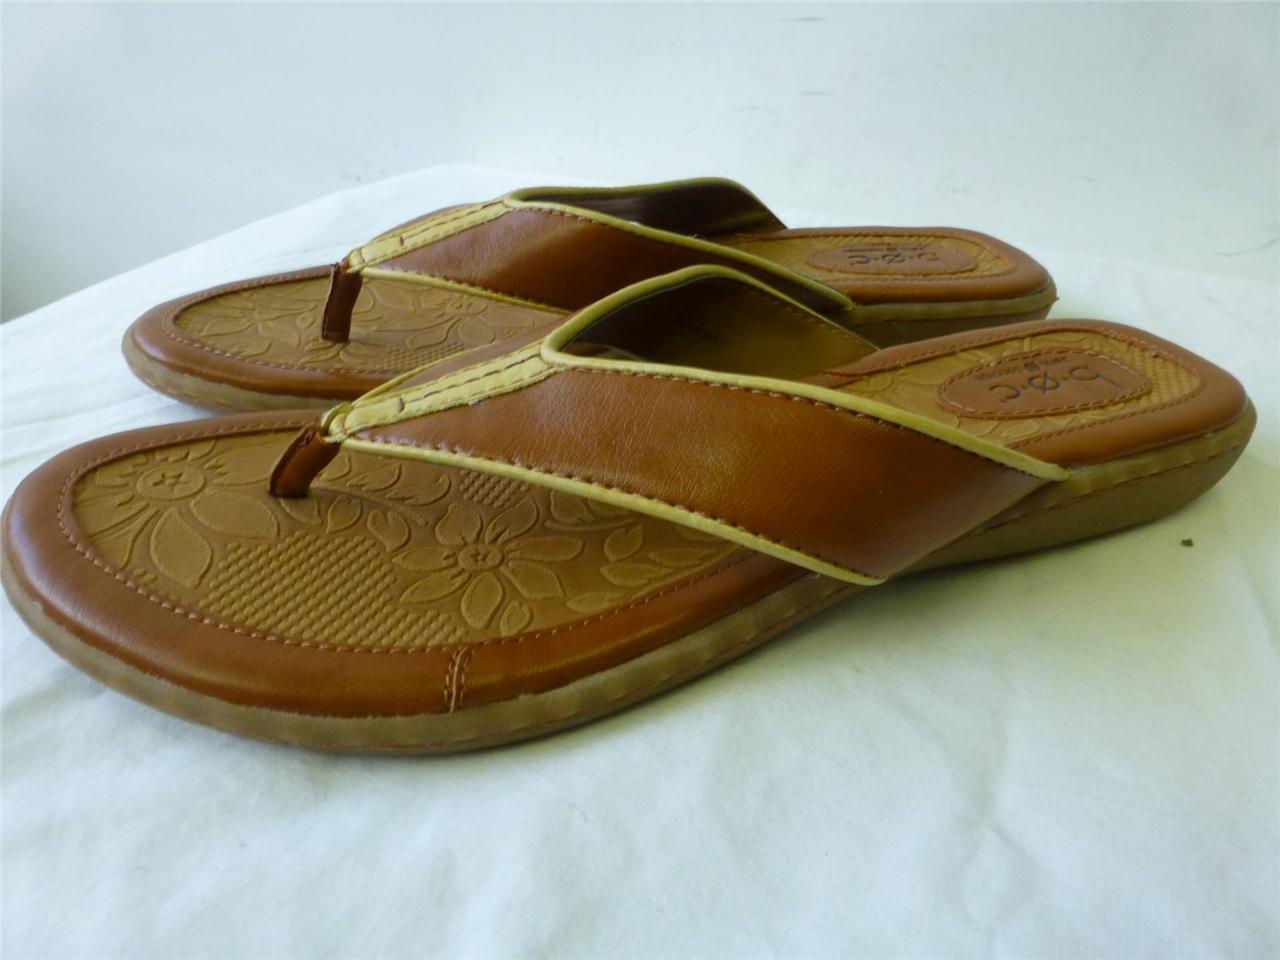 NEW brown womens BOC BORN Concept brown NEW slip sandals flip flops thongs shoes sz 10 42 ccf7b8